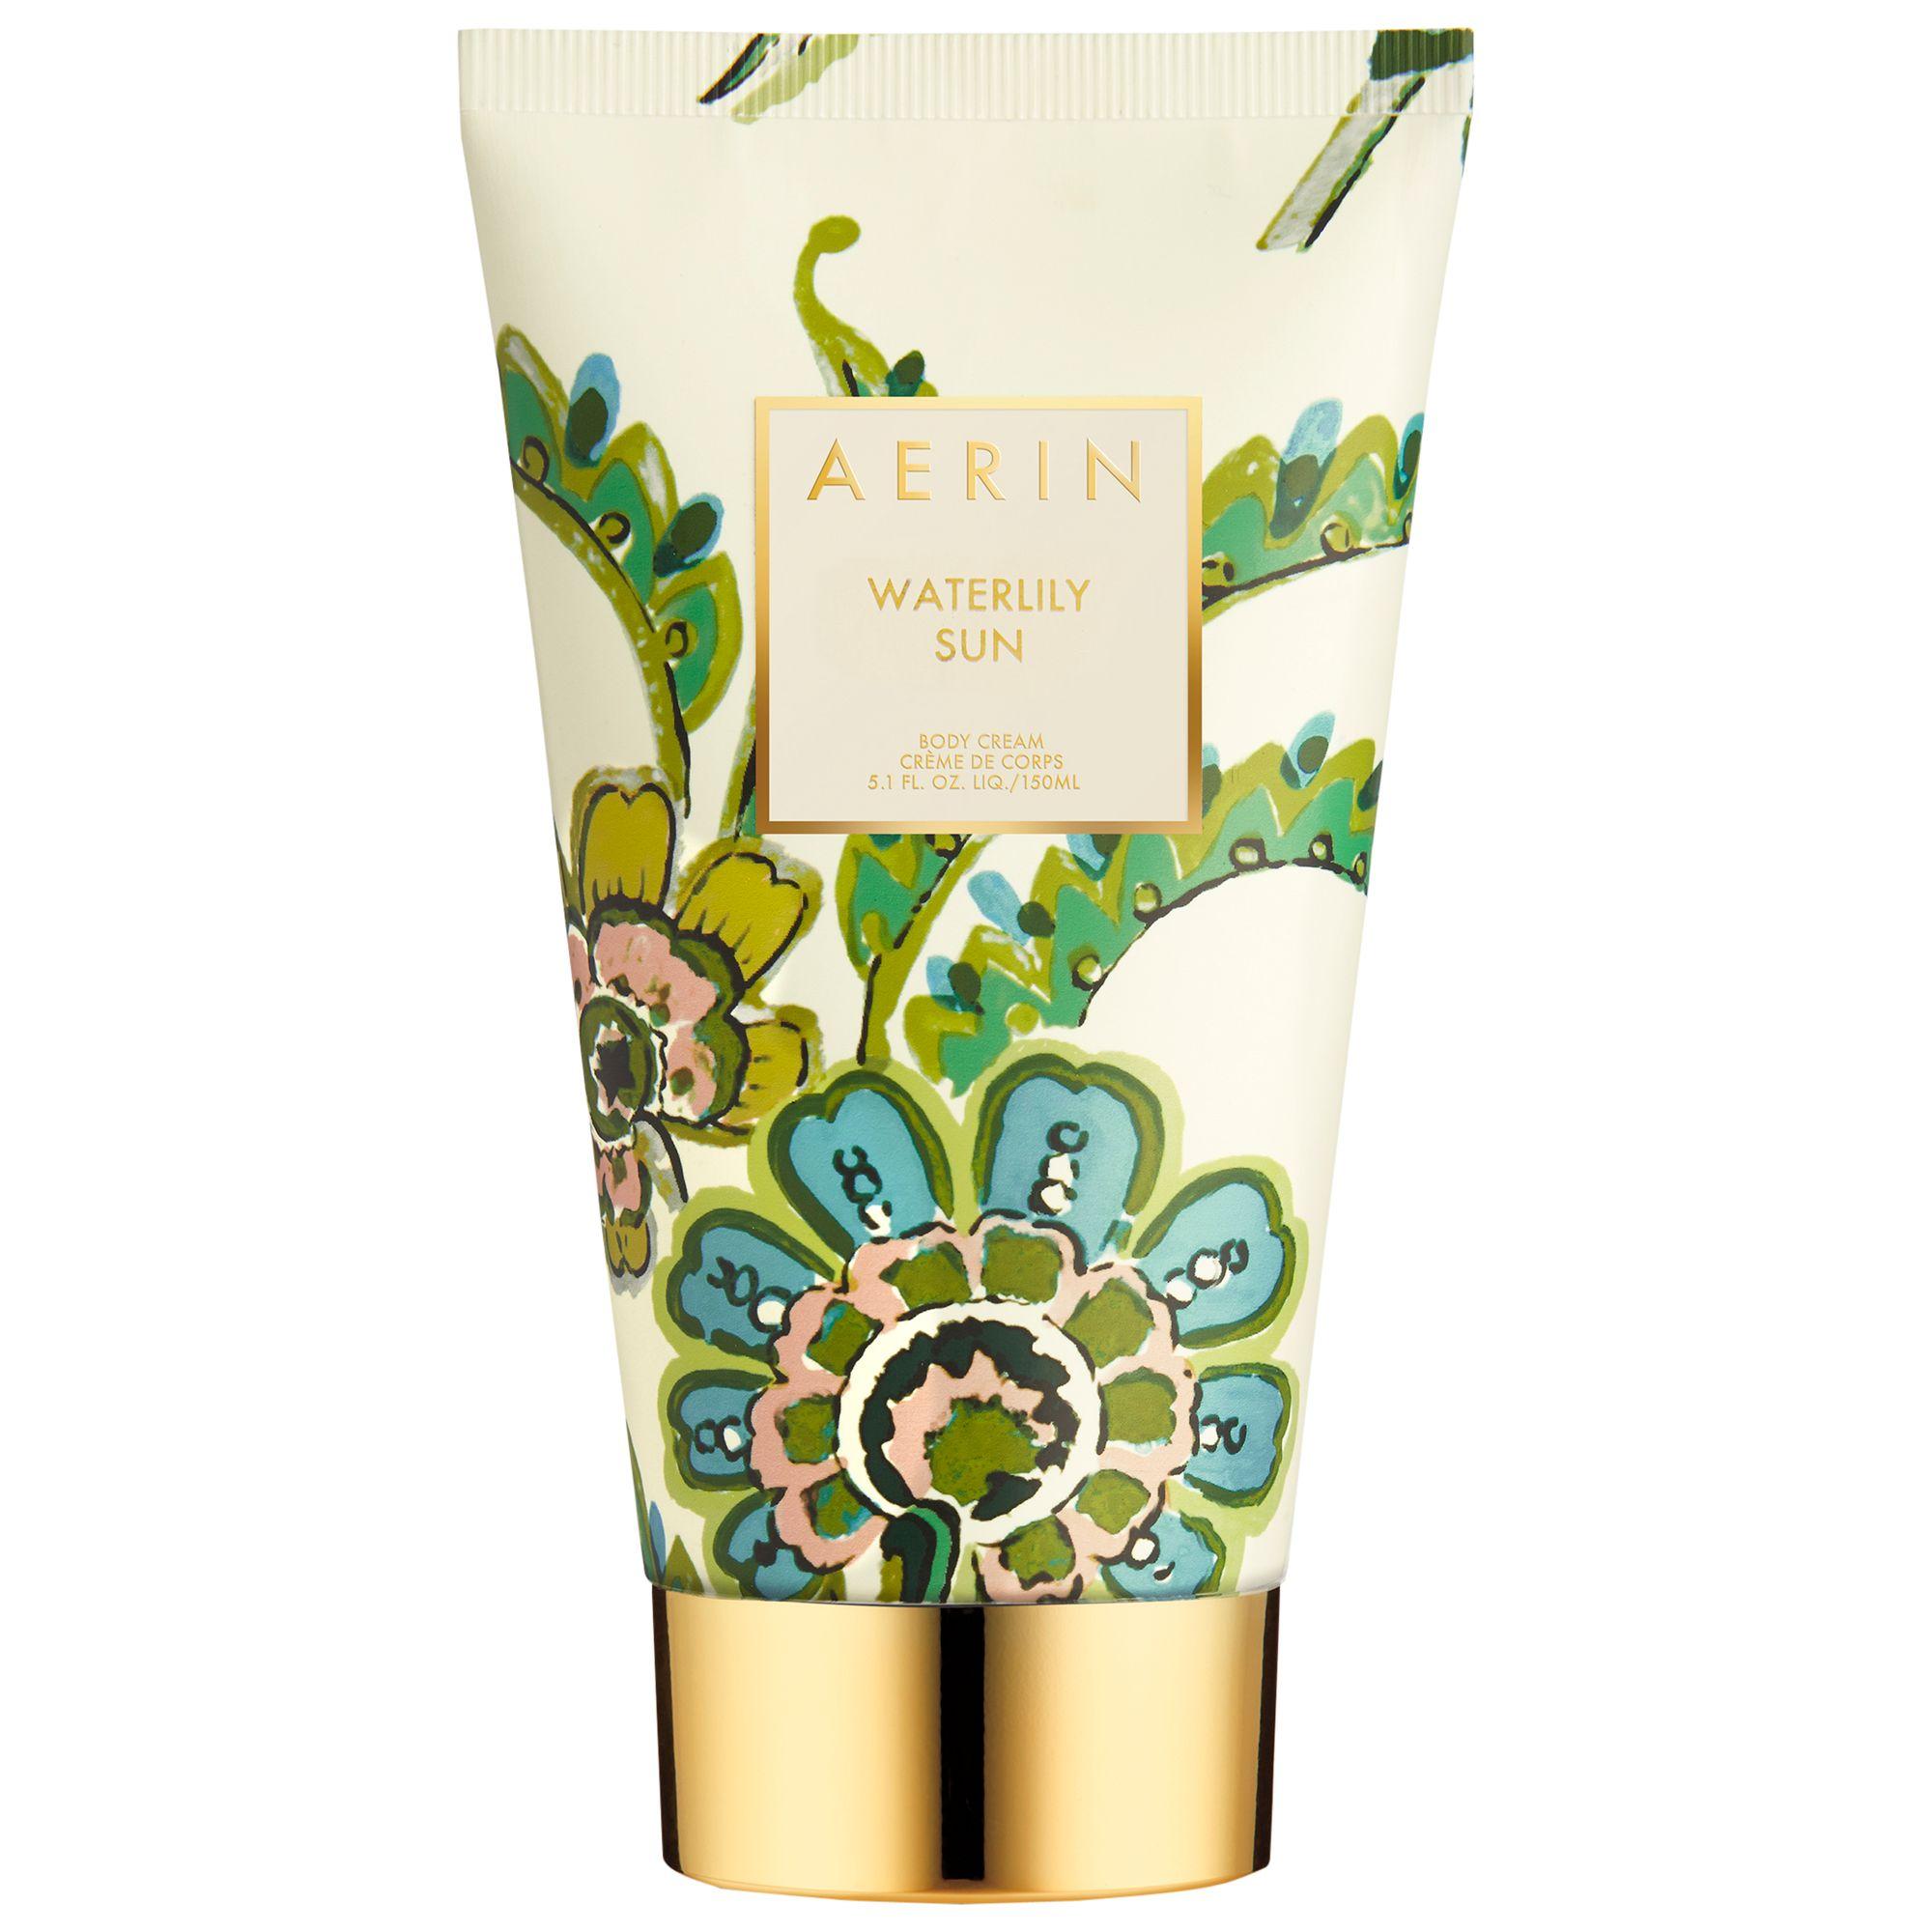 AERIN AERIN Waterlily Sun Body Cream, 150ml